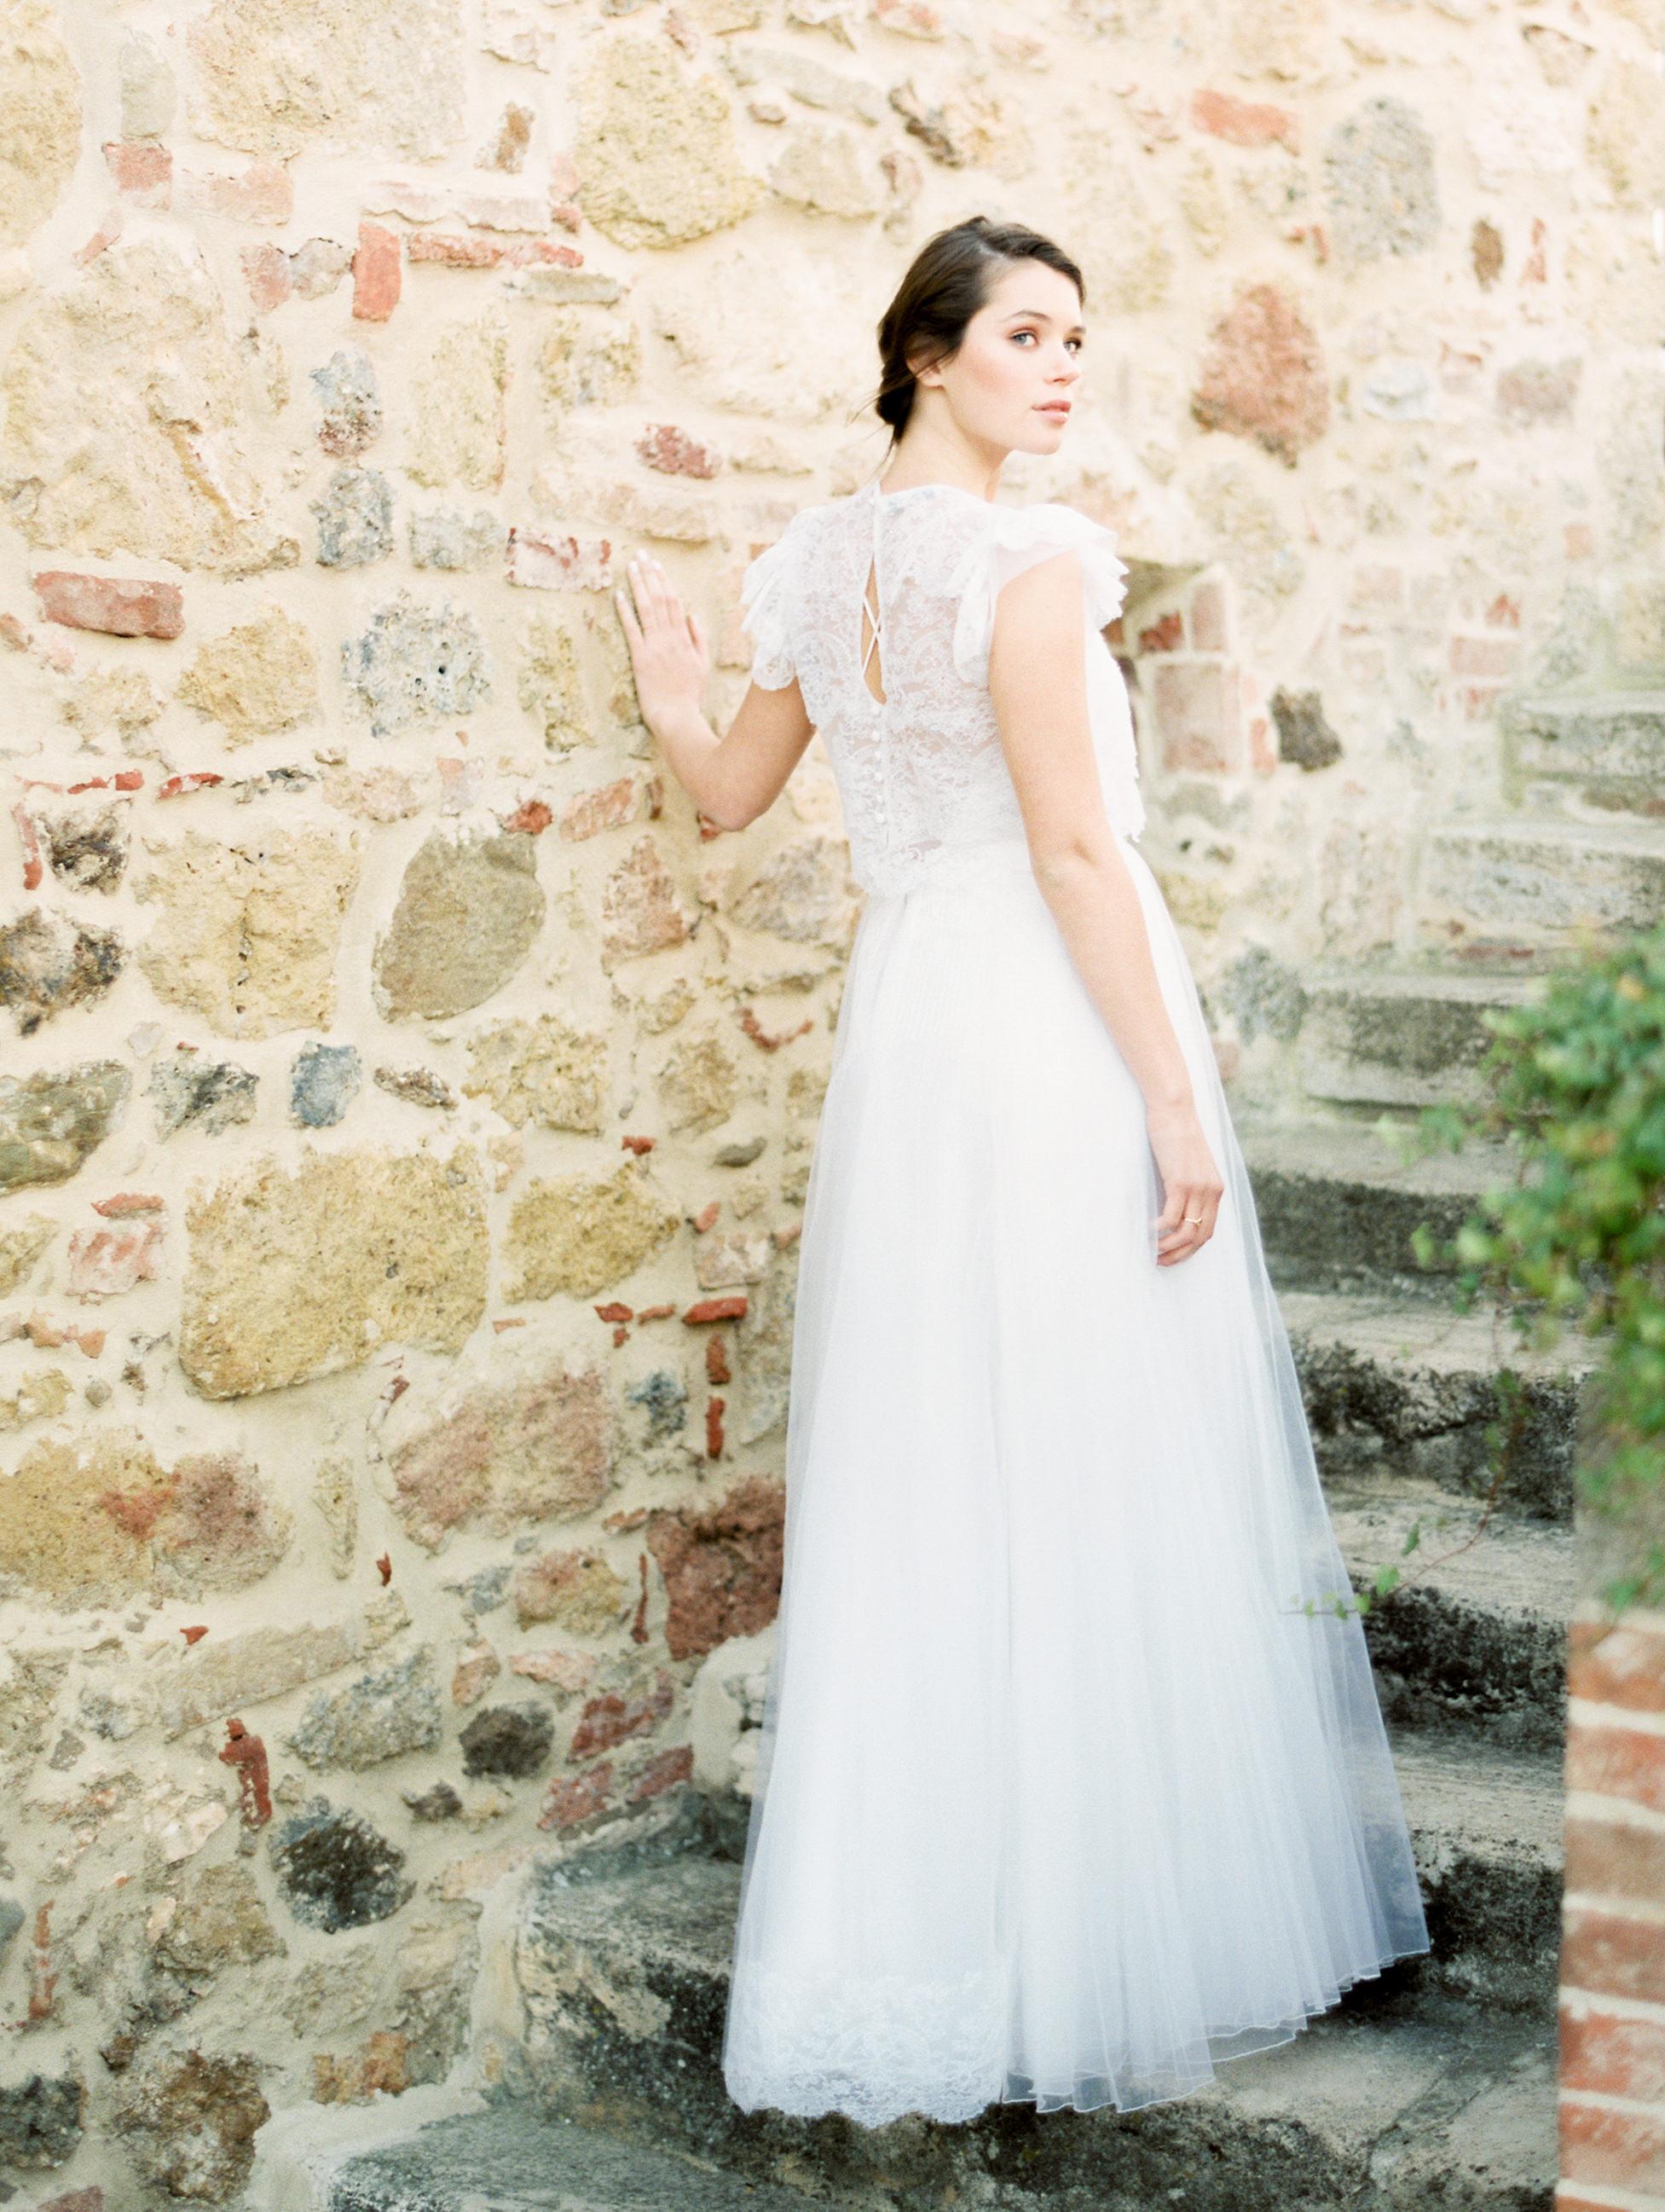 romantic-italy-wedding-in-tuscany-130.jpg